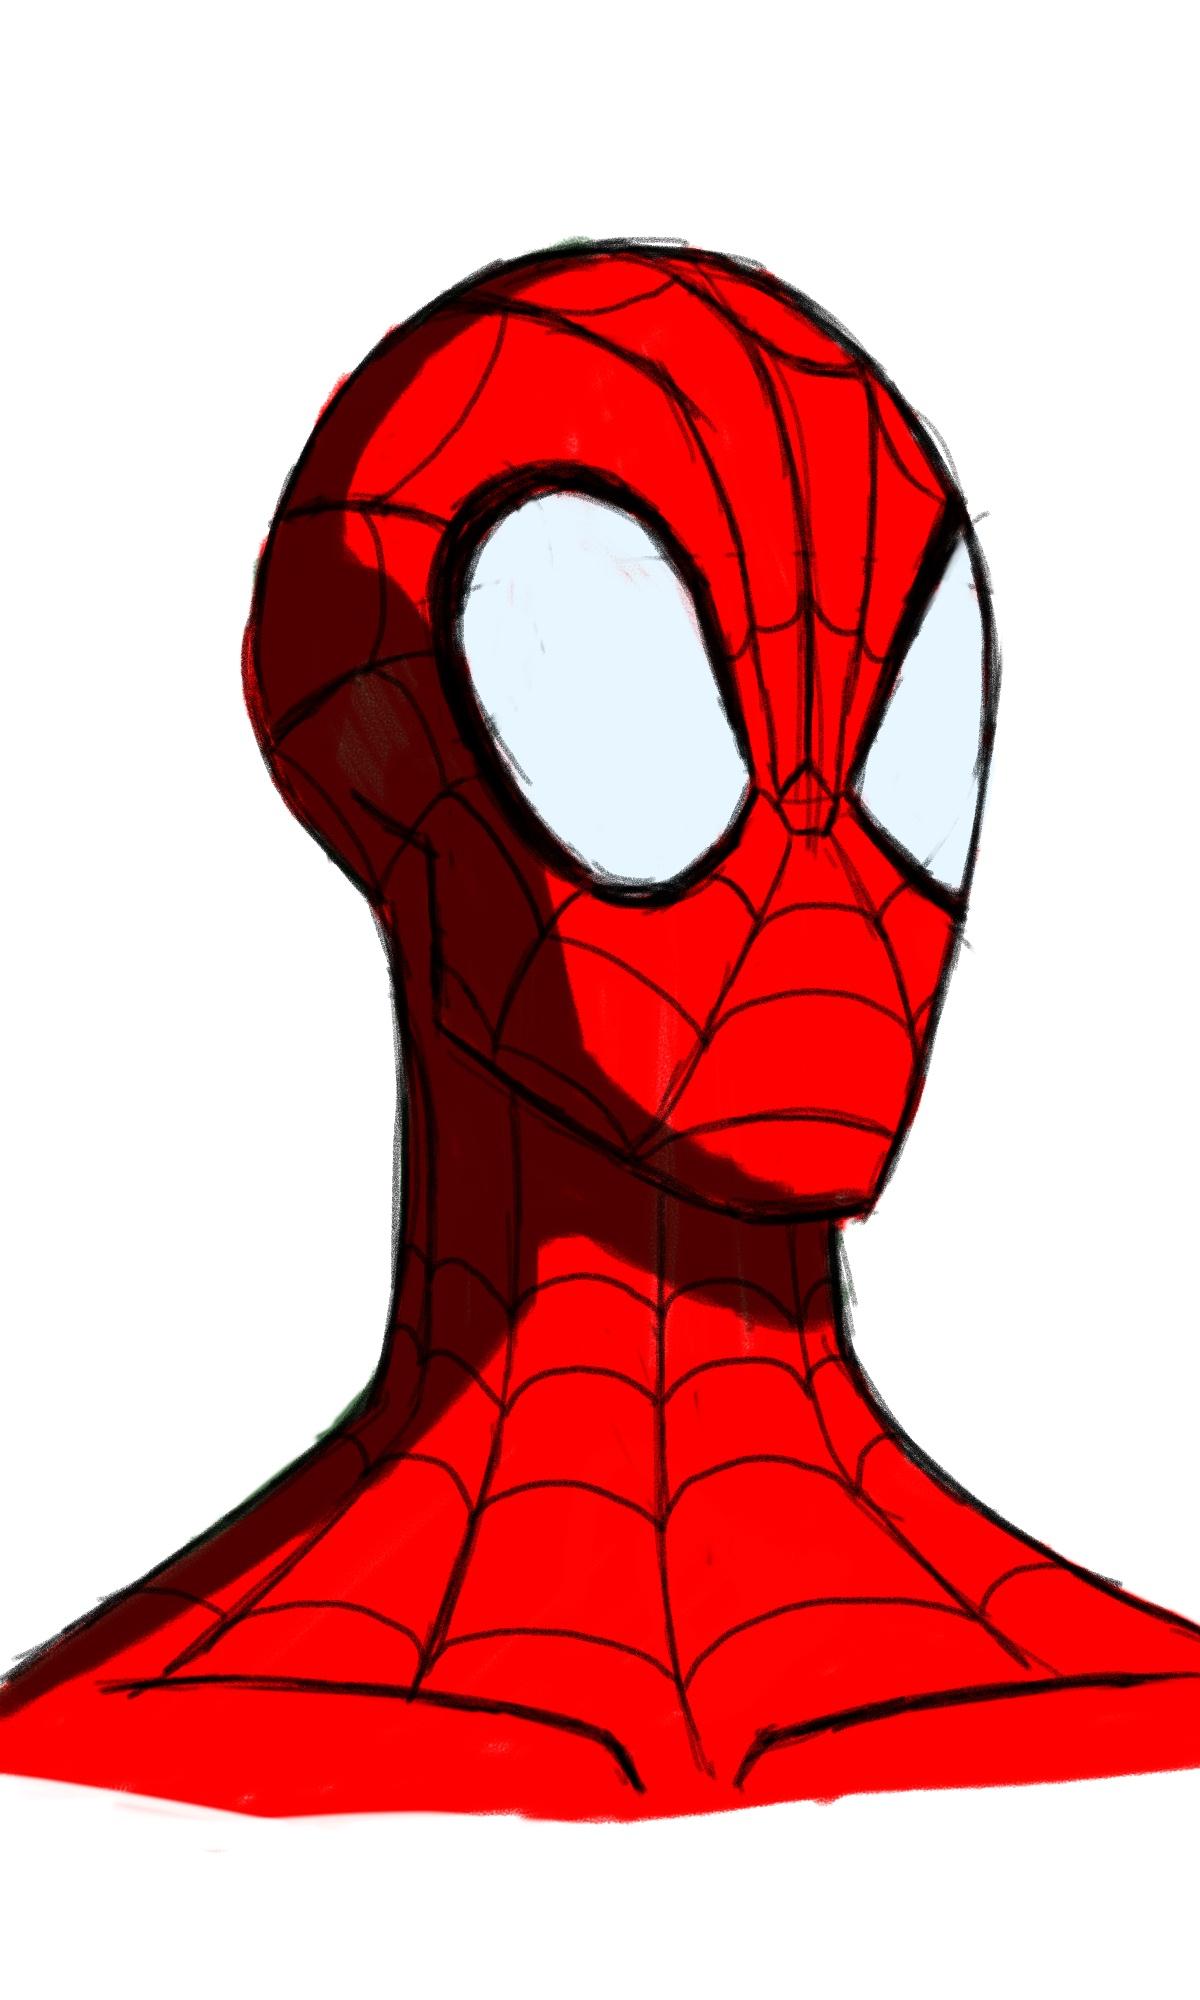 2021-07-15 - Spiderman